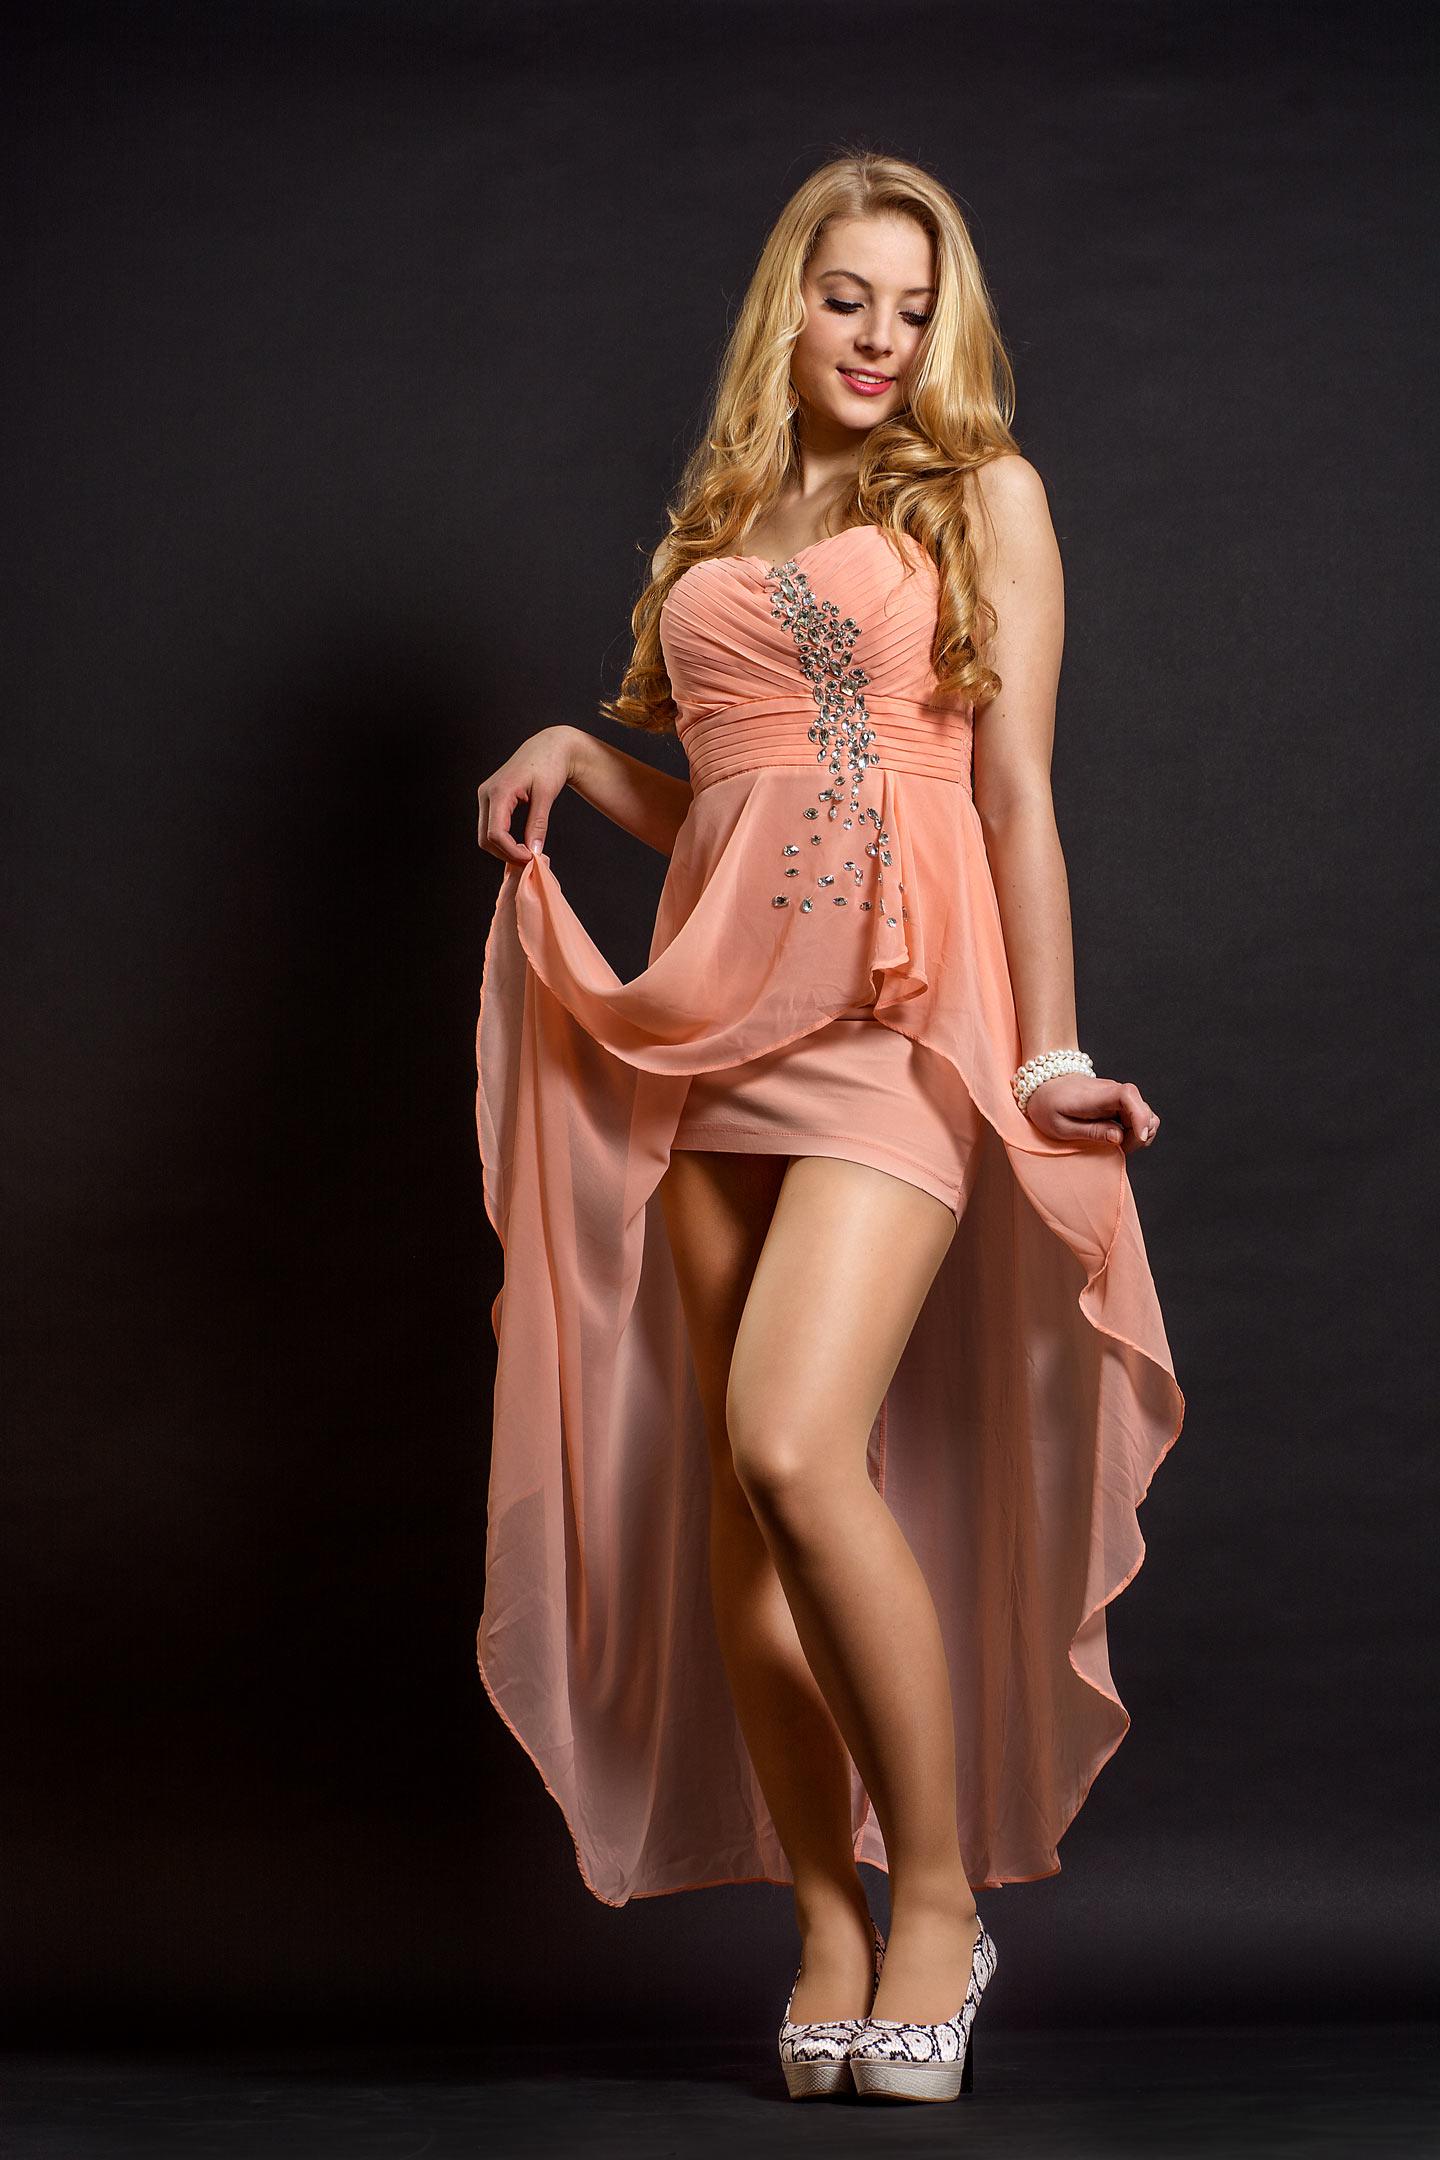 sexy Pose blonde Frau